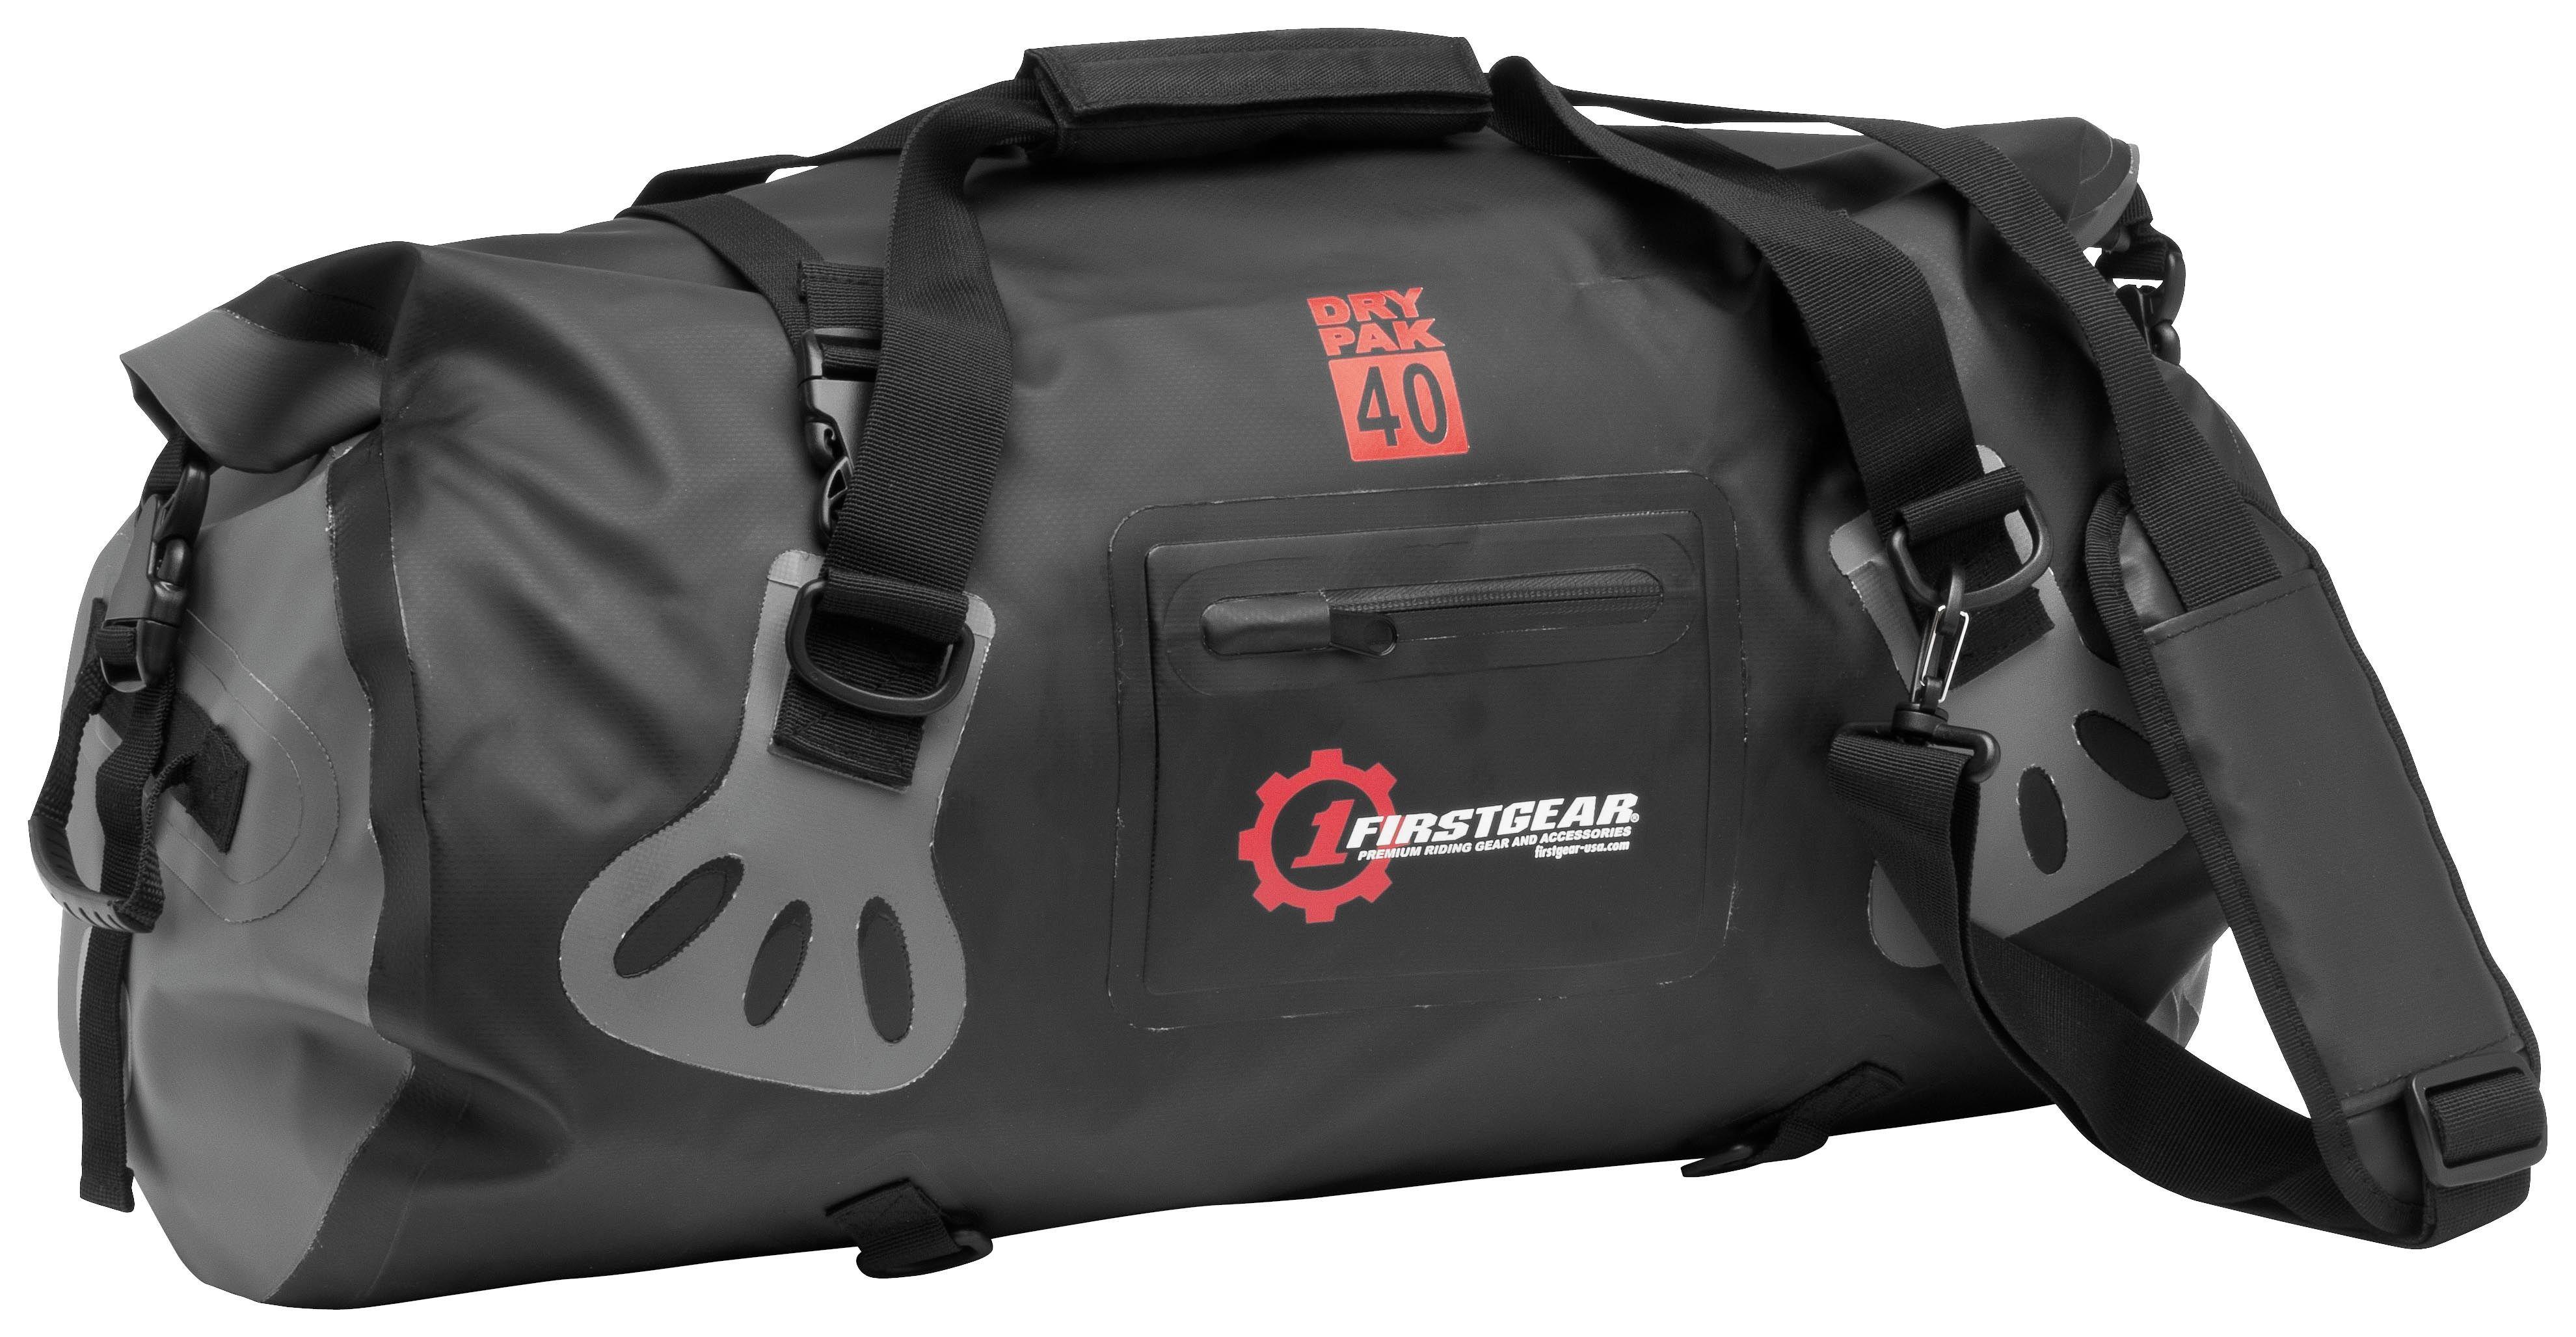 562b80025675 Firstgear Torrent Duffle Bag - RevZilla